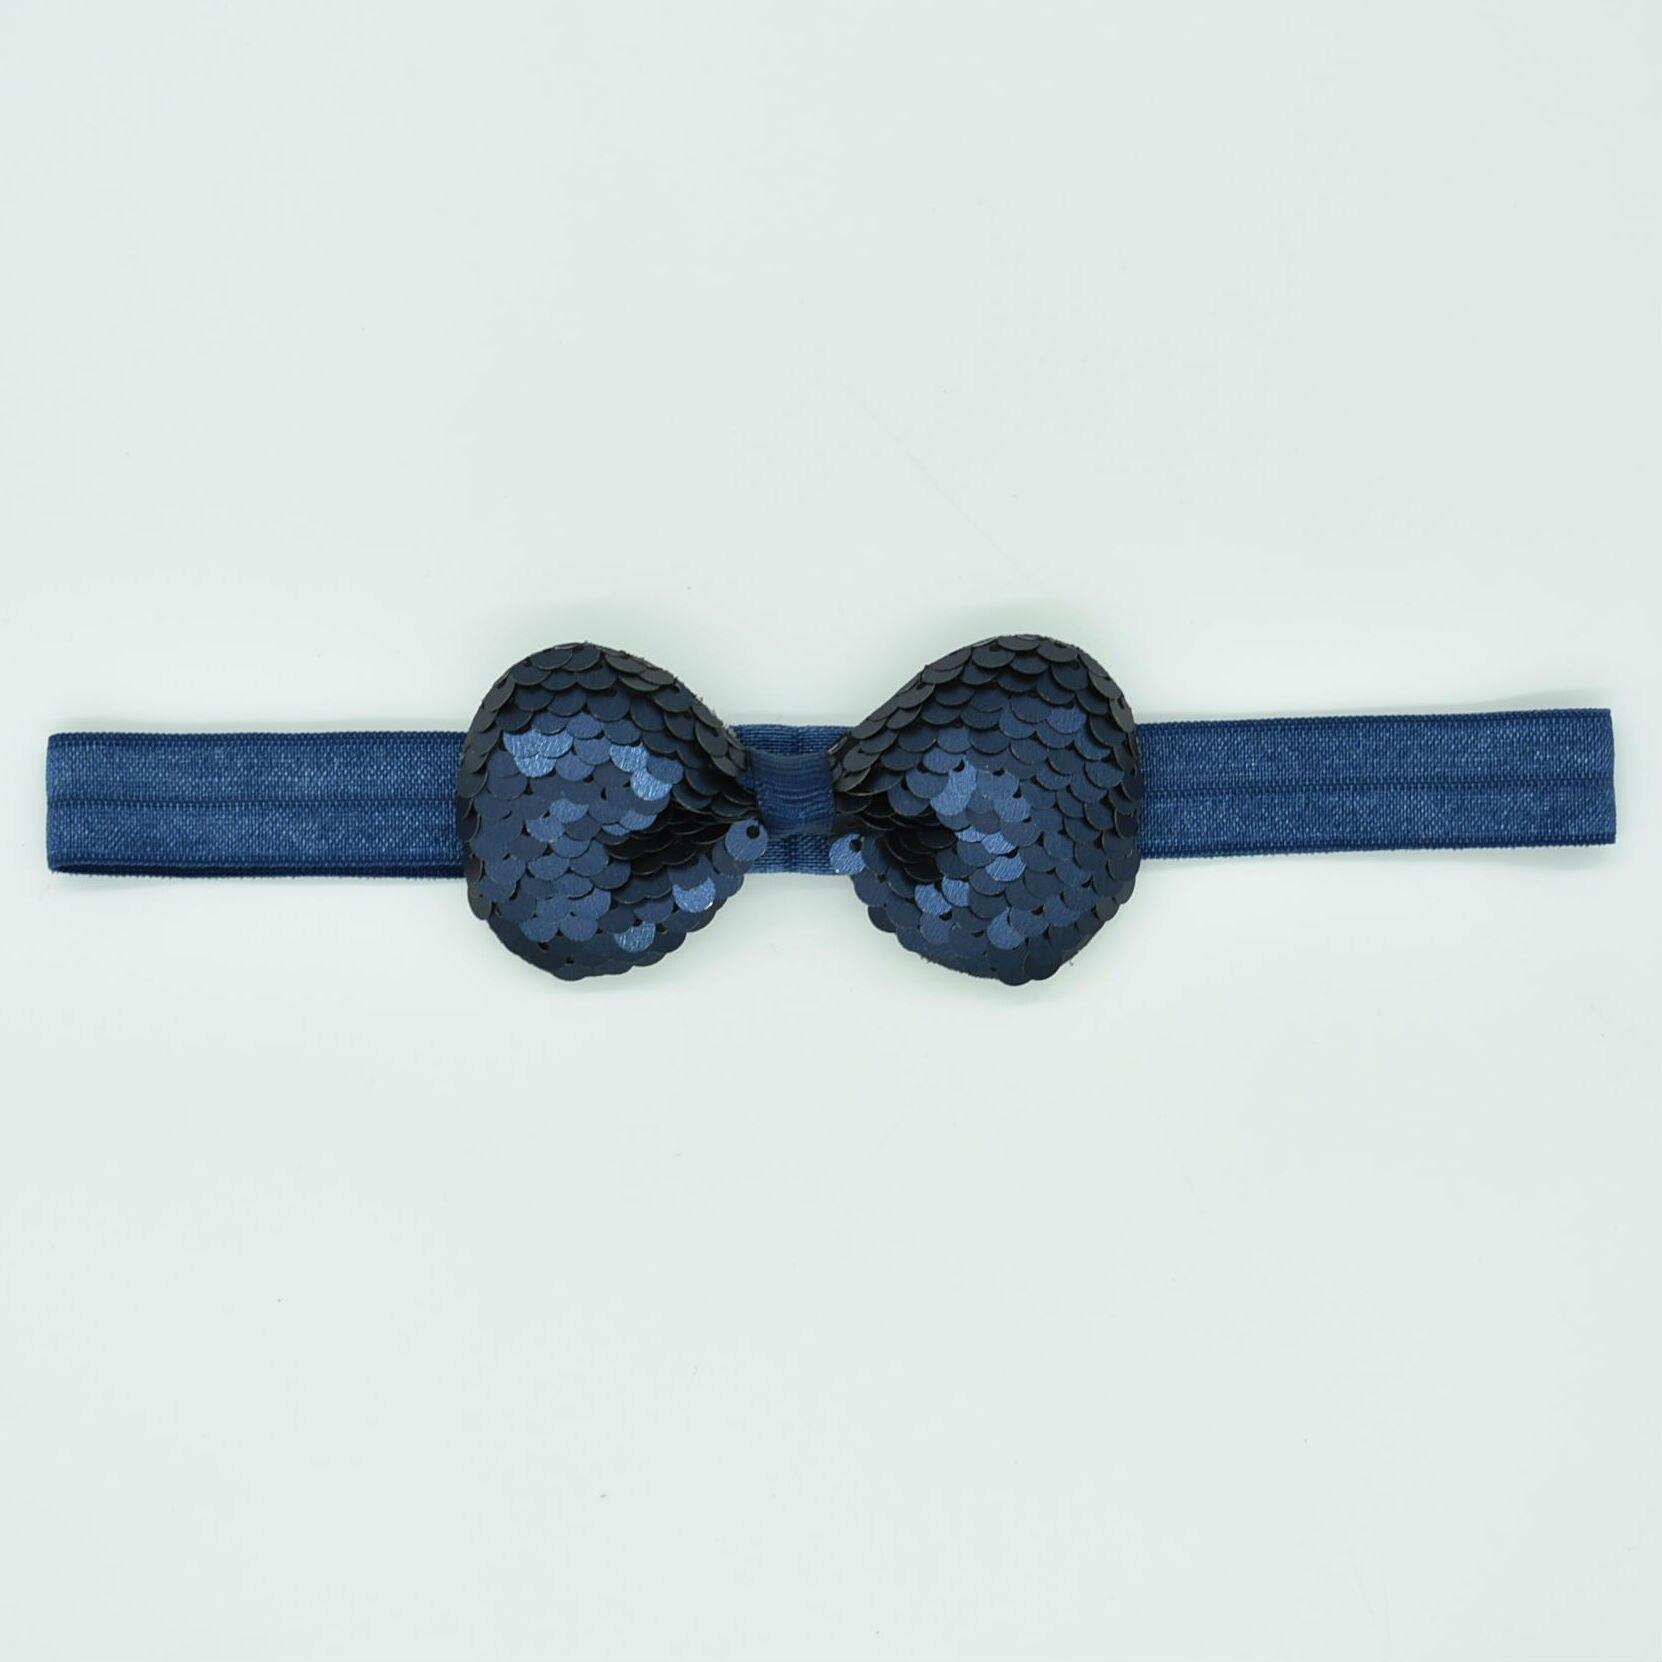 Newborn bow hair headdress popular childrens band multi-layer sequin cute new accessories